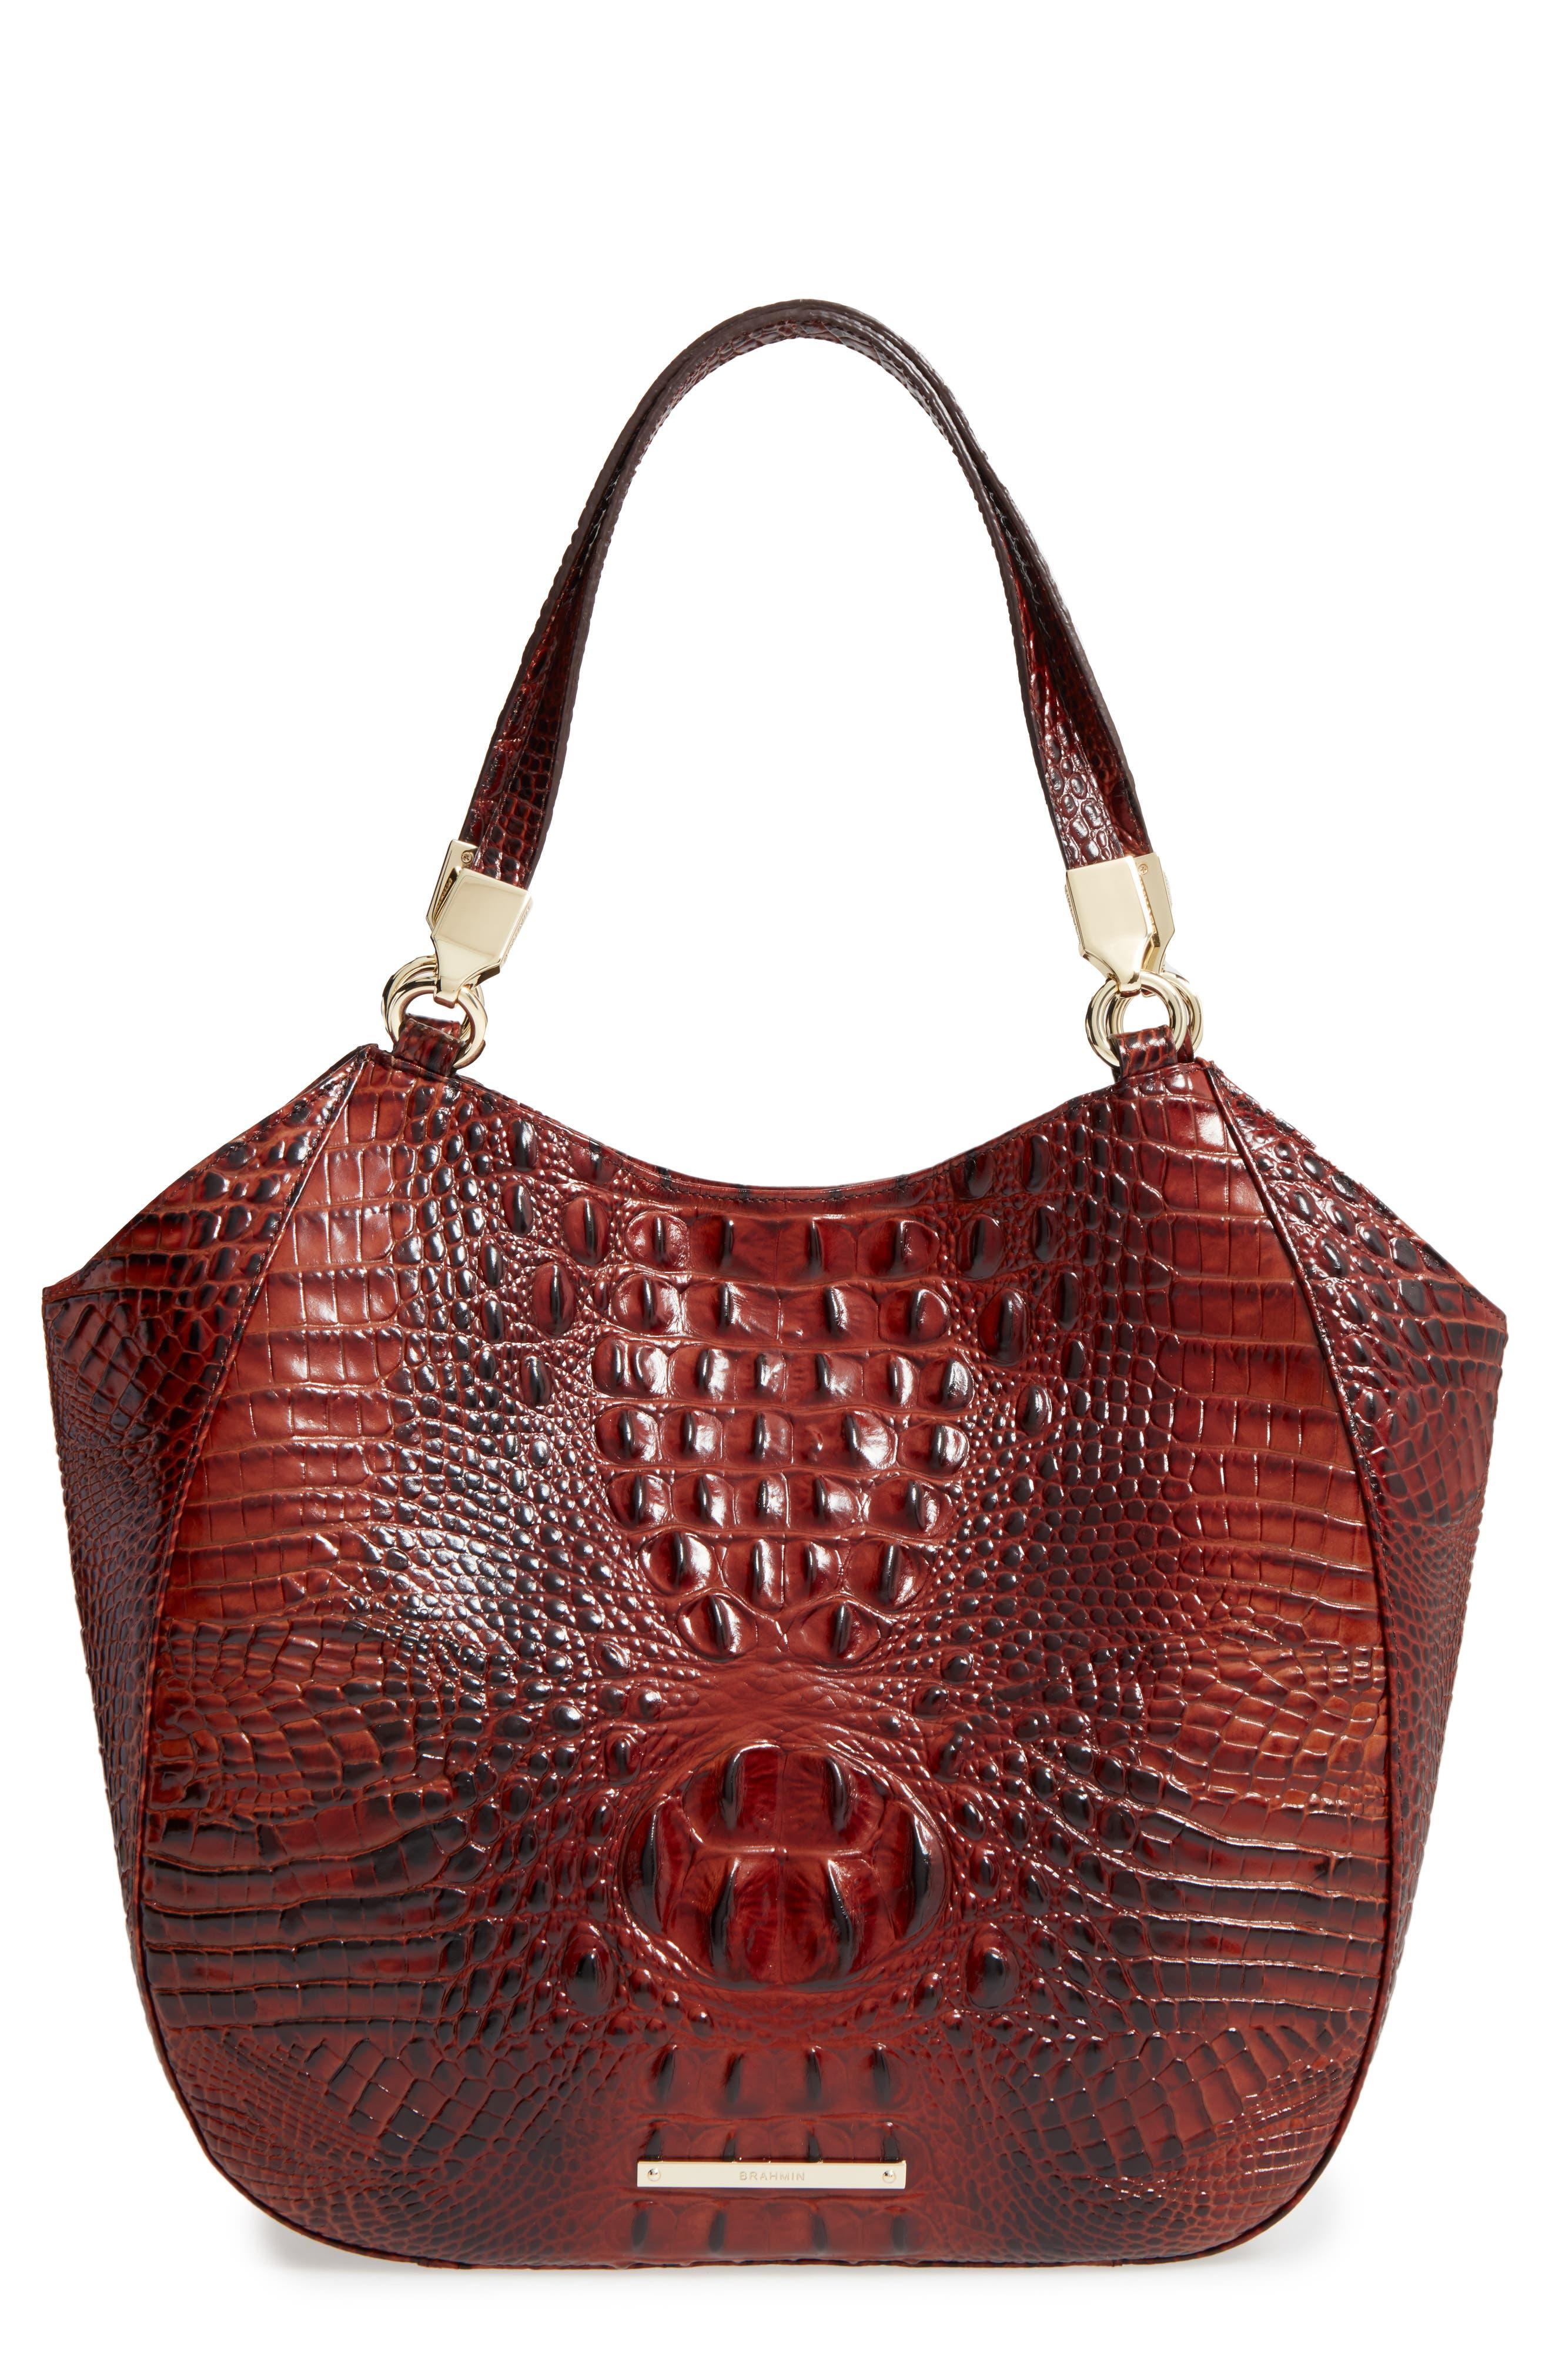 Main Image - Brahmin Melbourne Marianna Leather Tote